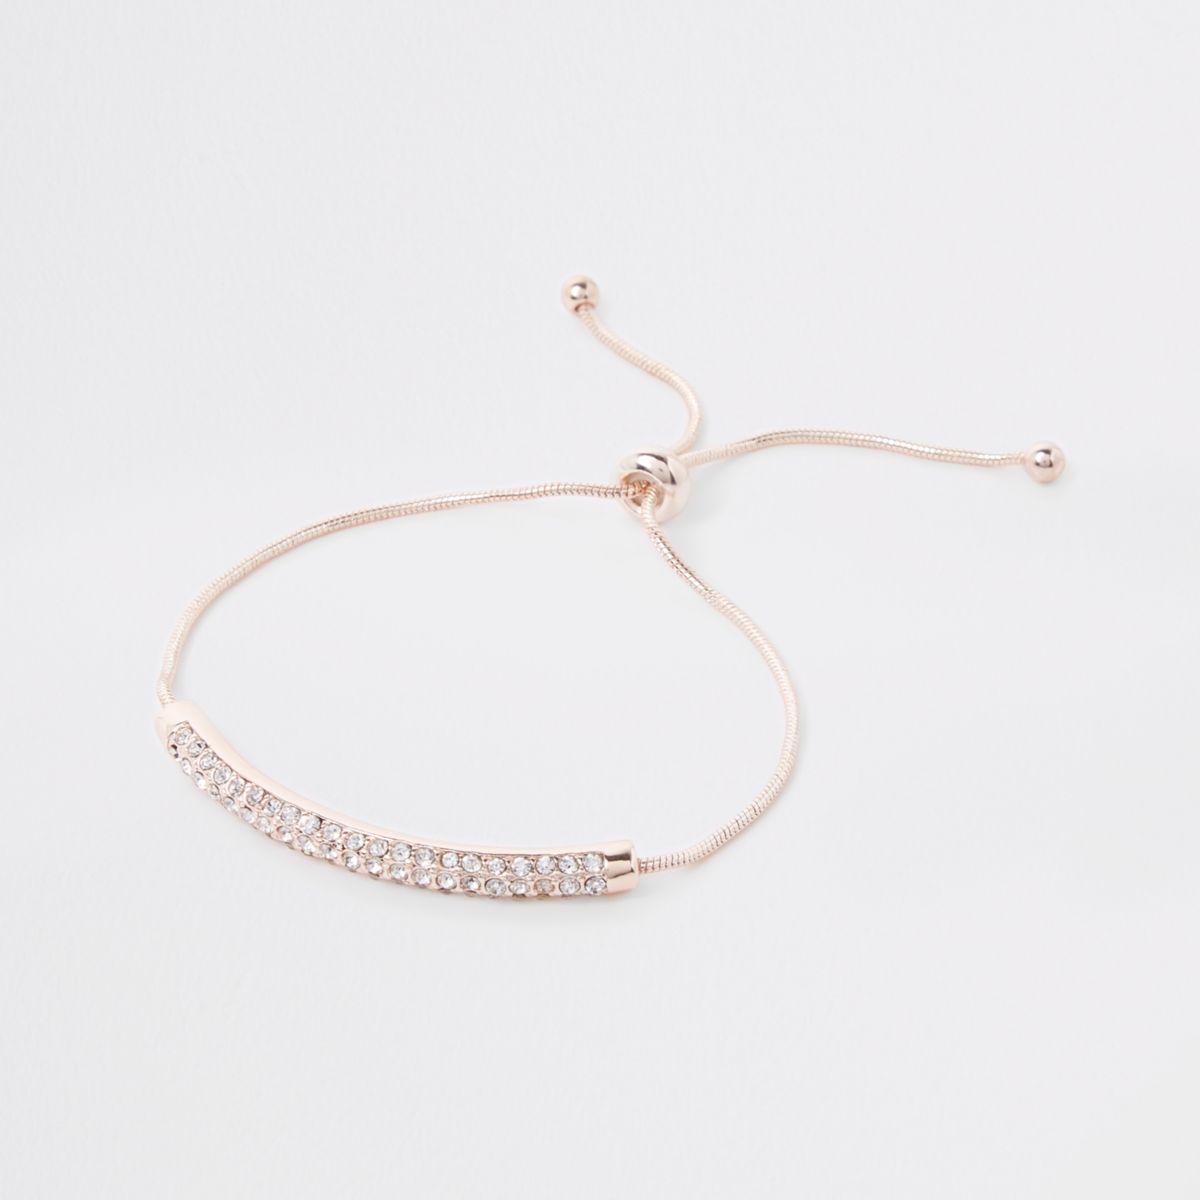 Rose gold tone rhinestone bar bracelet